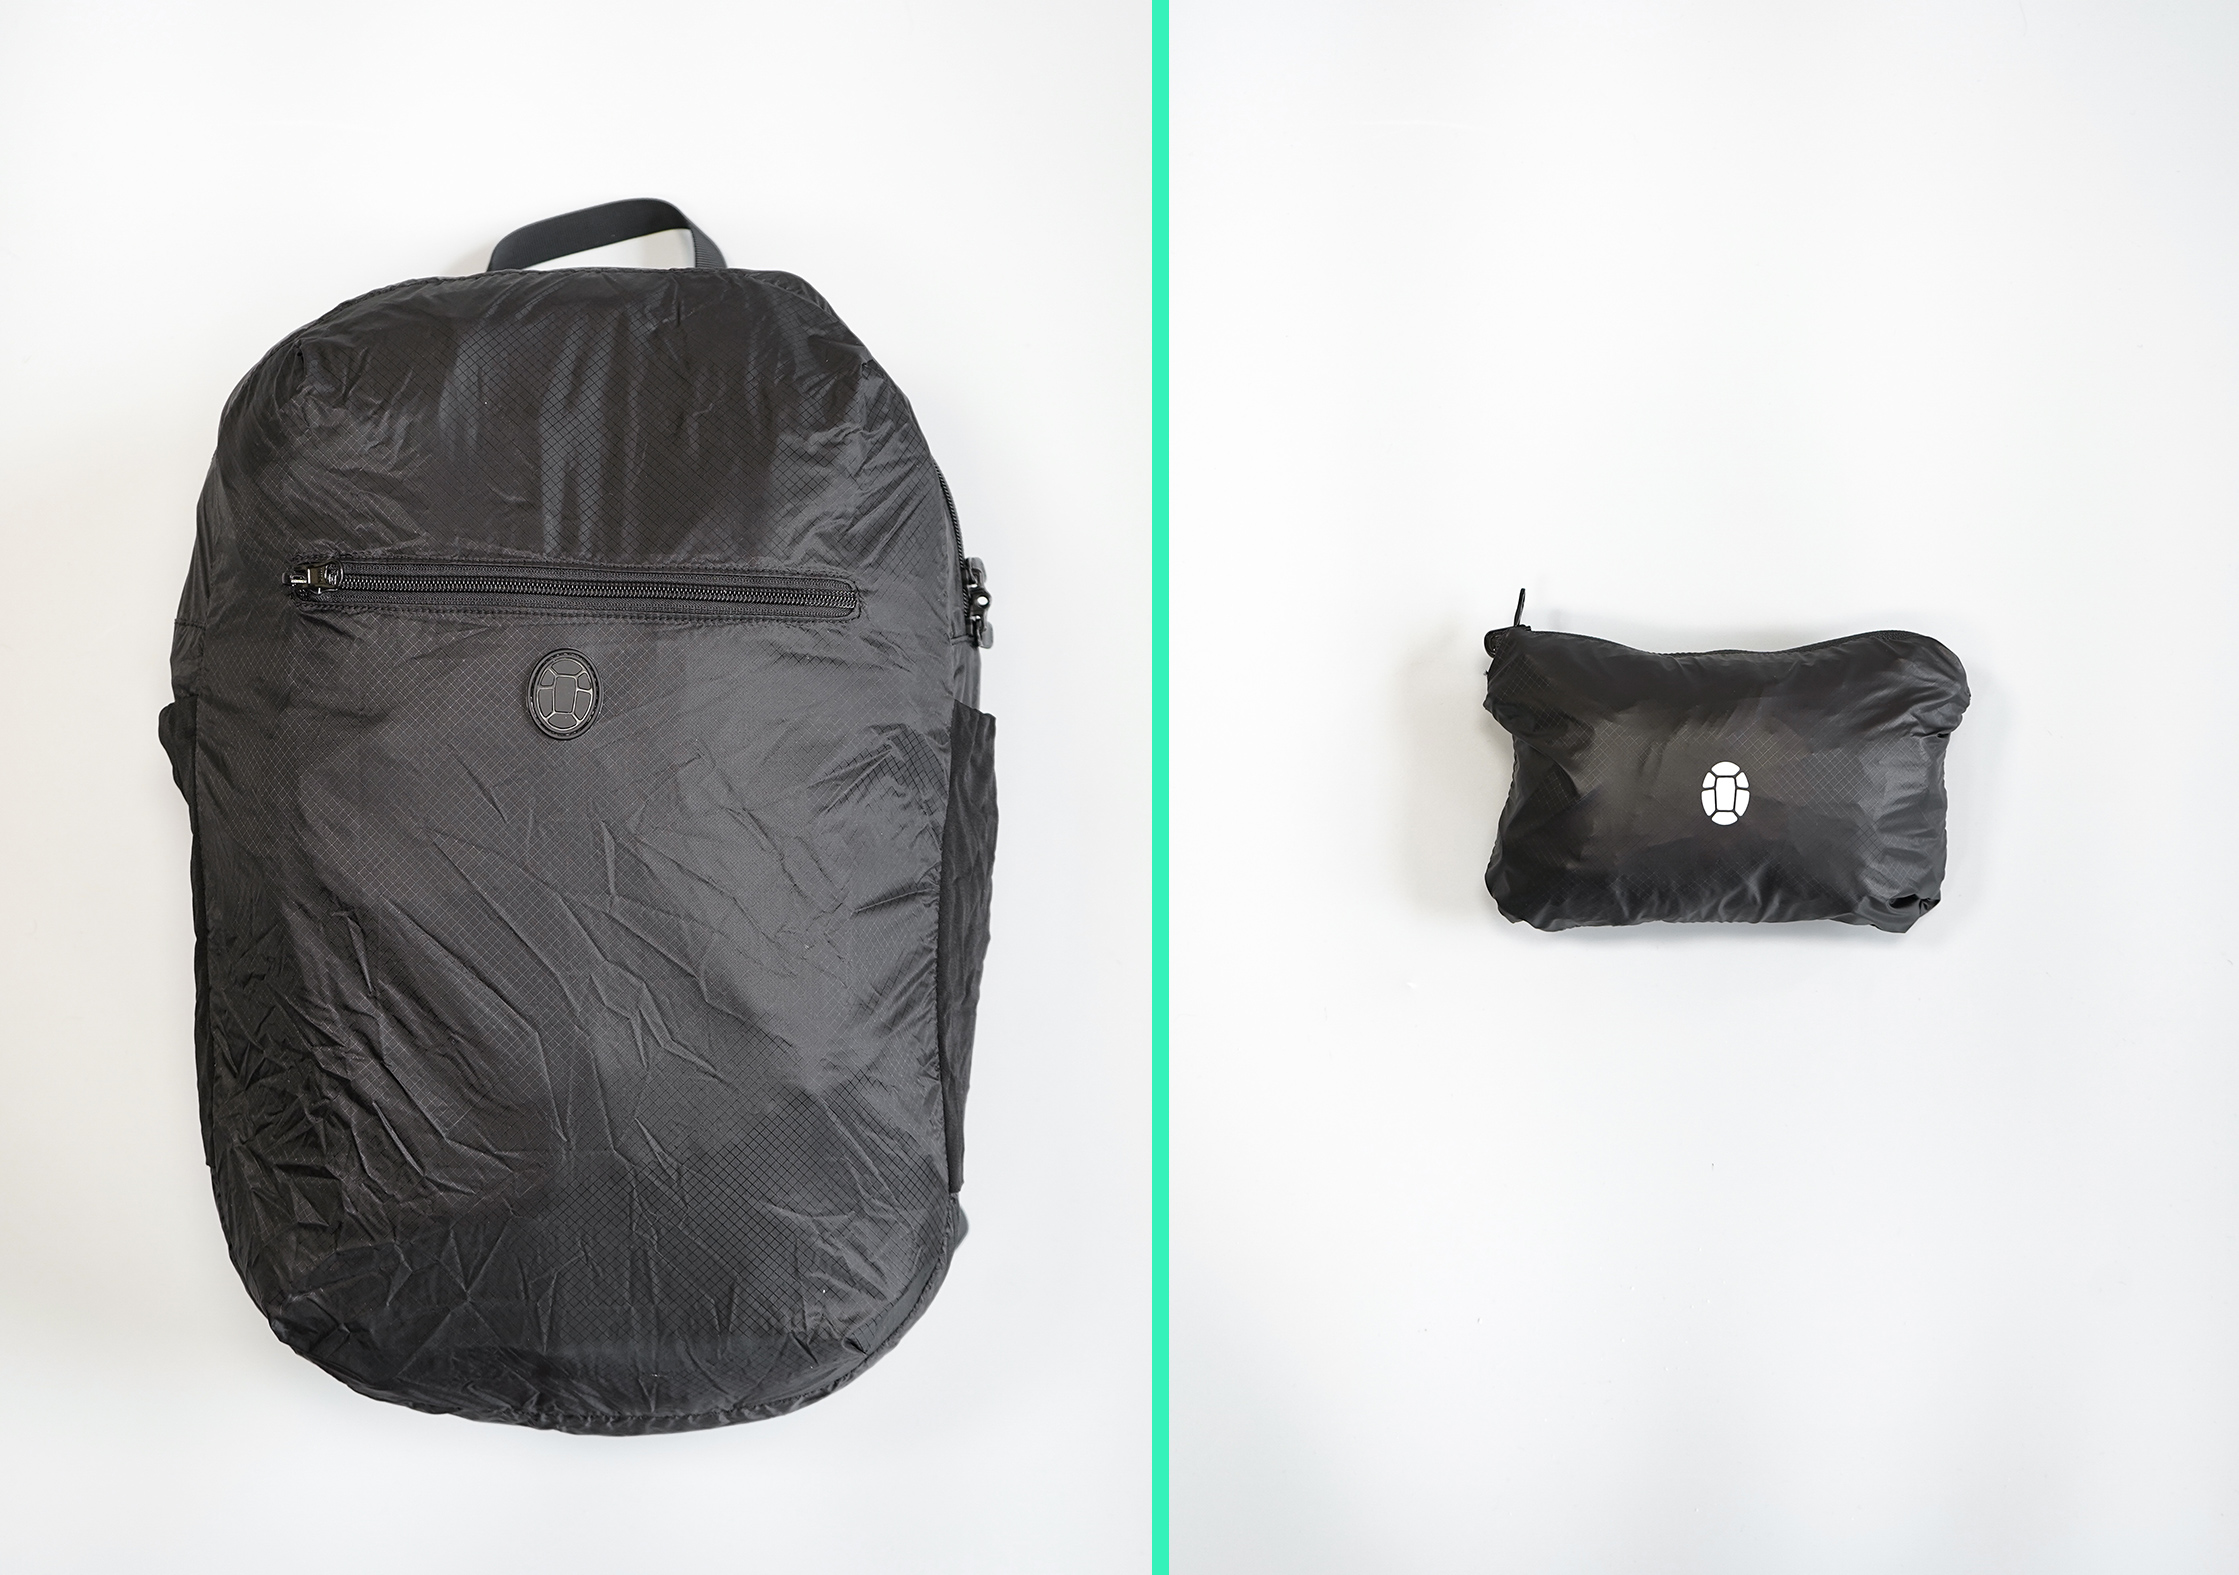 Tortuga Setout Packable Daypack Compressed Size Comparison